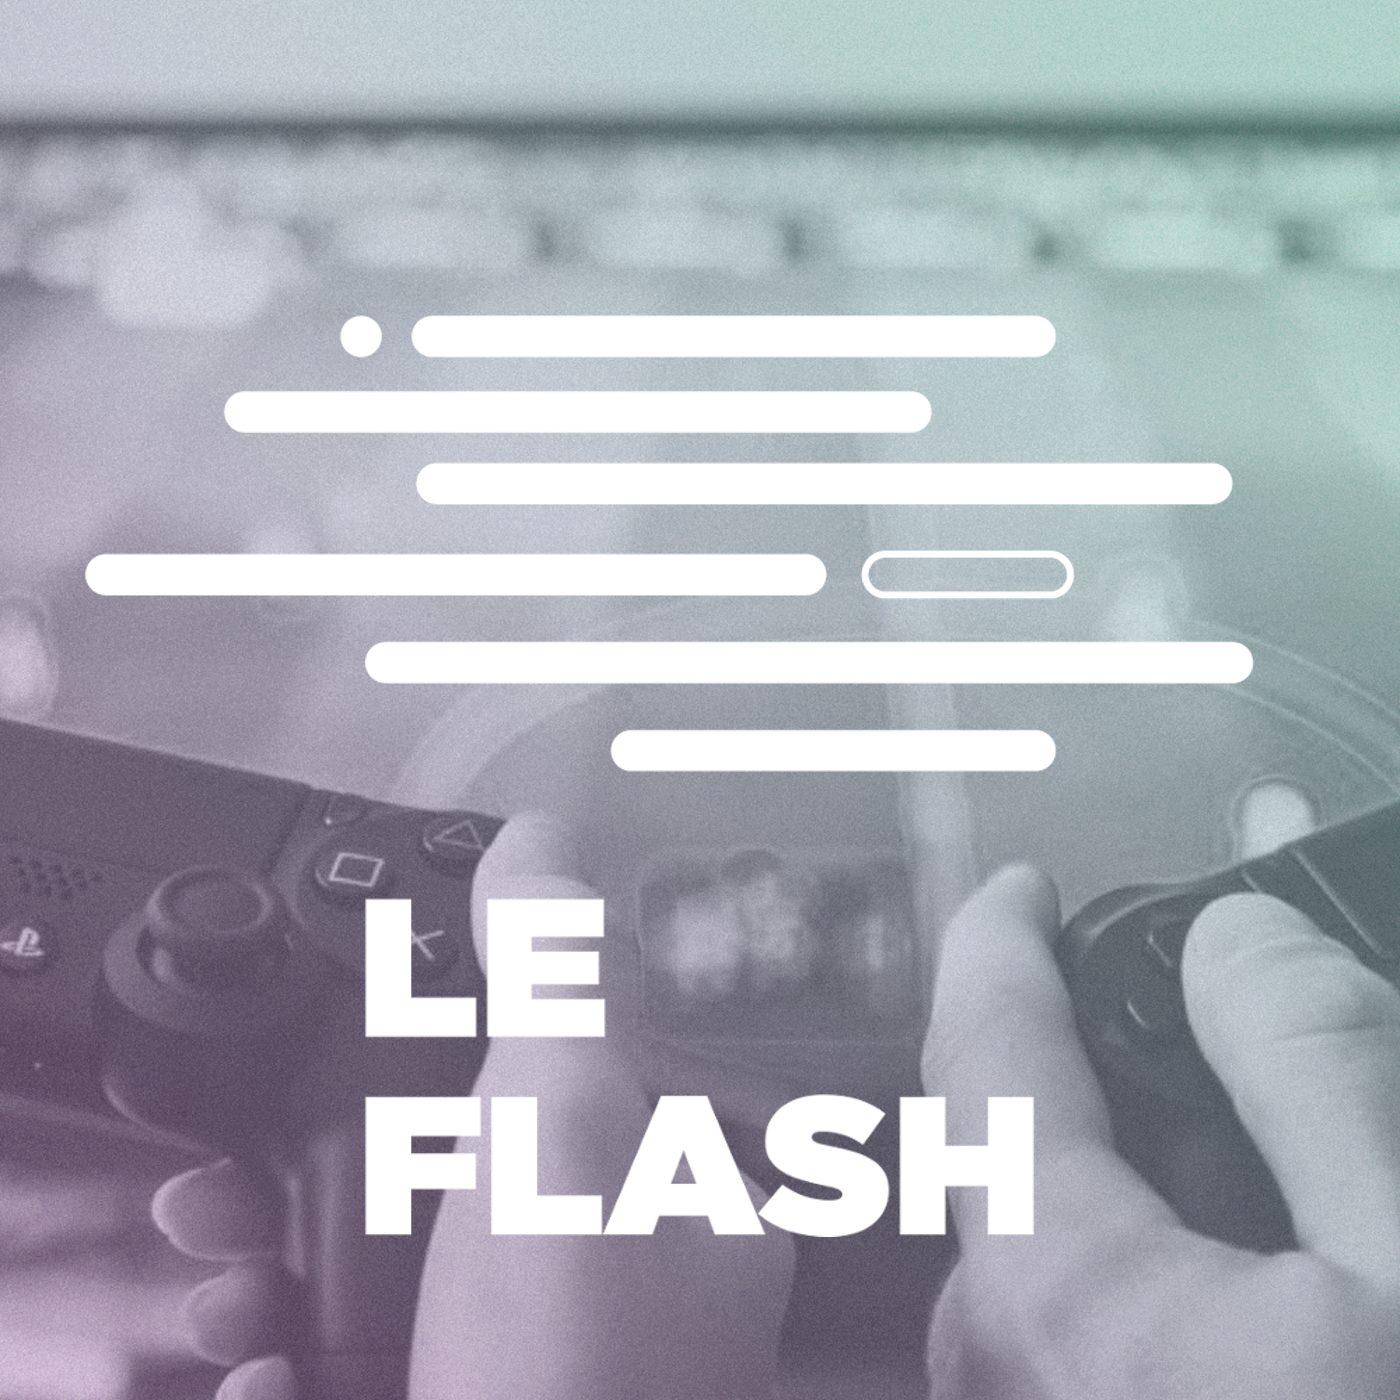 Flash - NFT, le futur de la blockchain